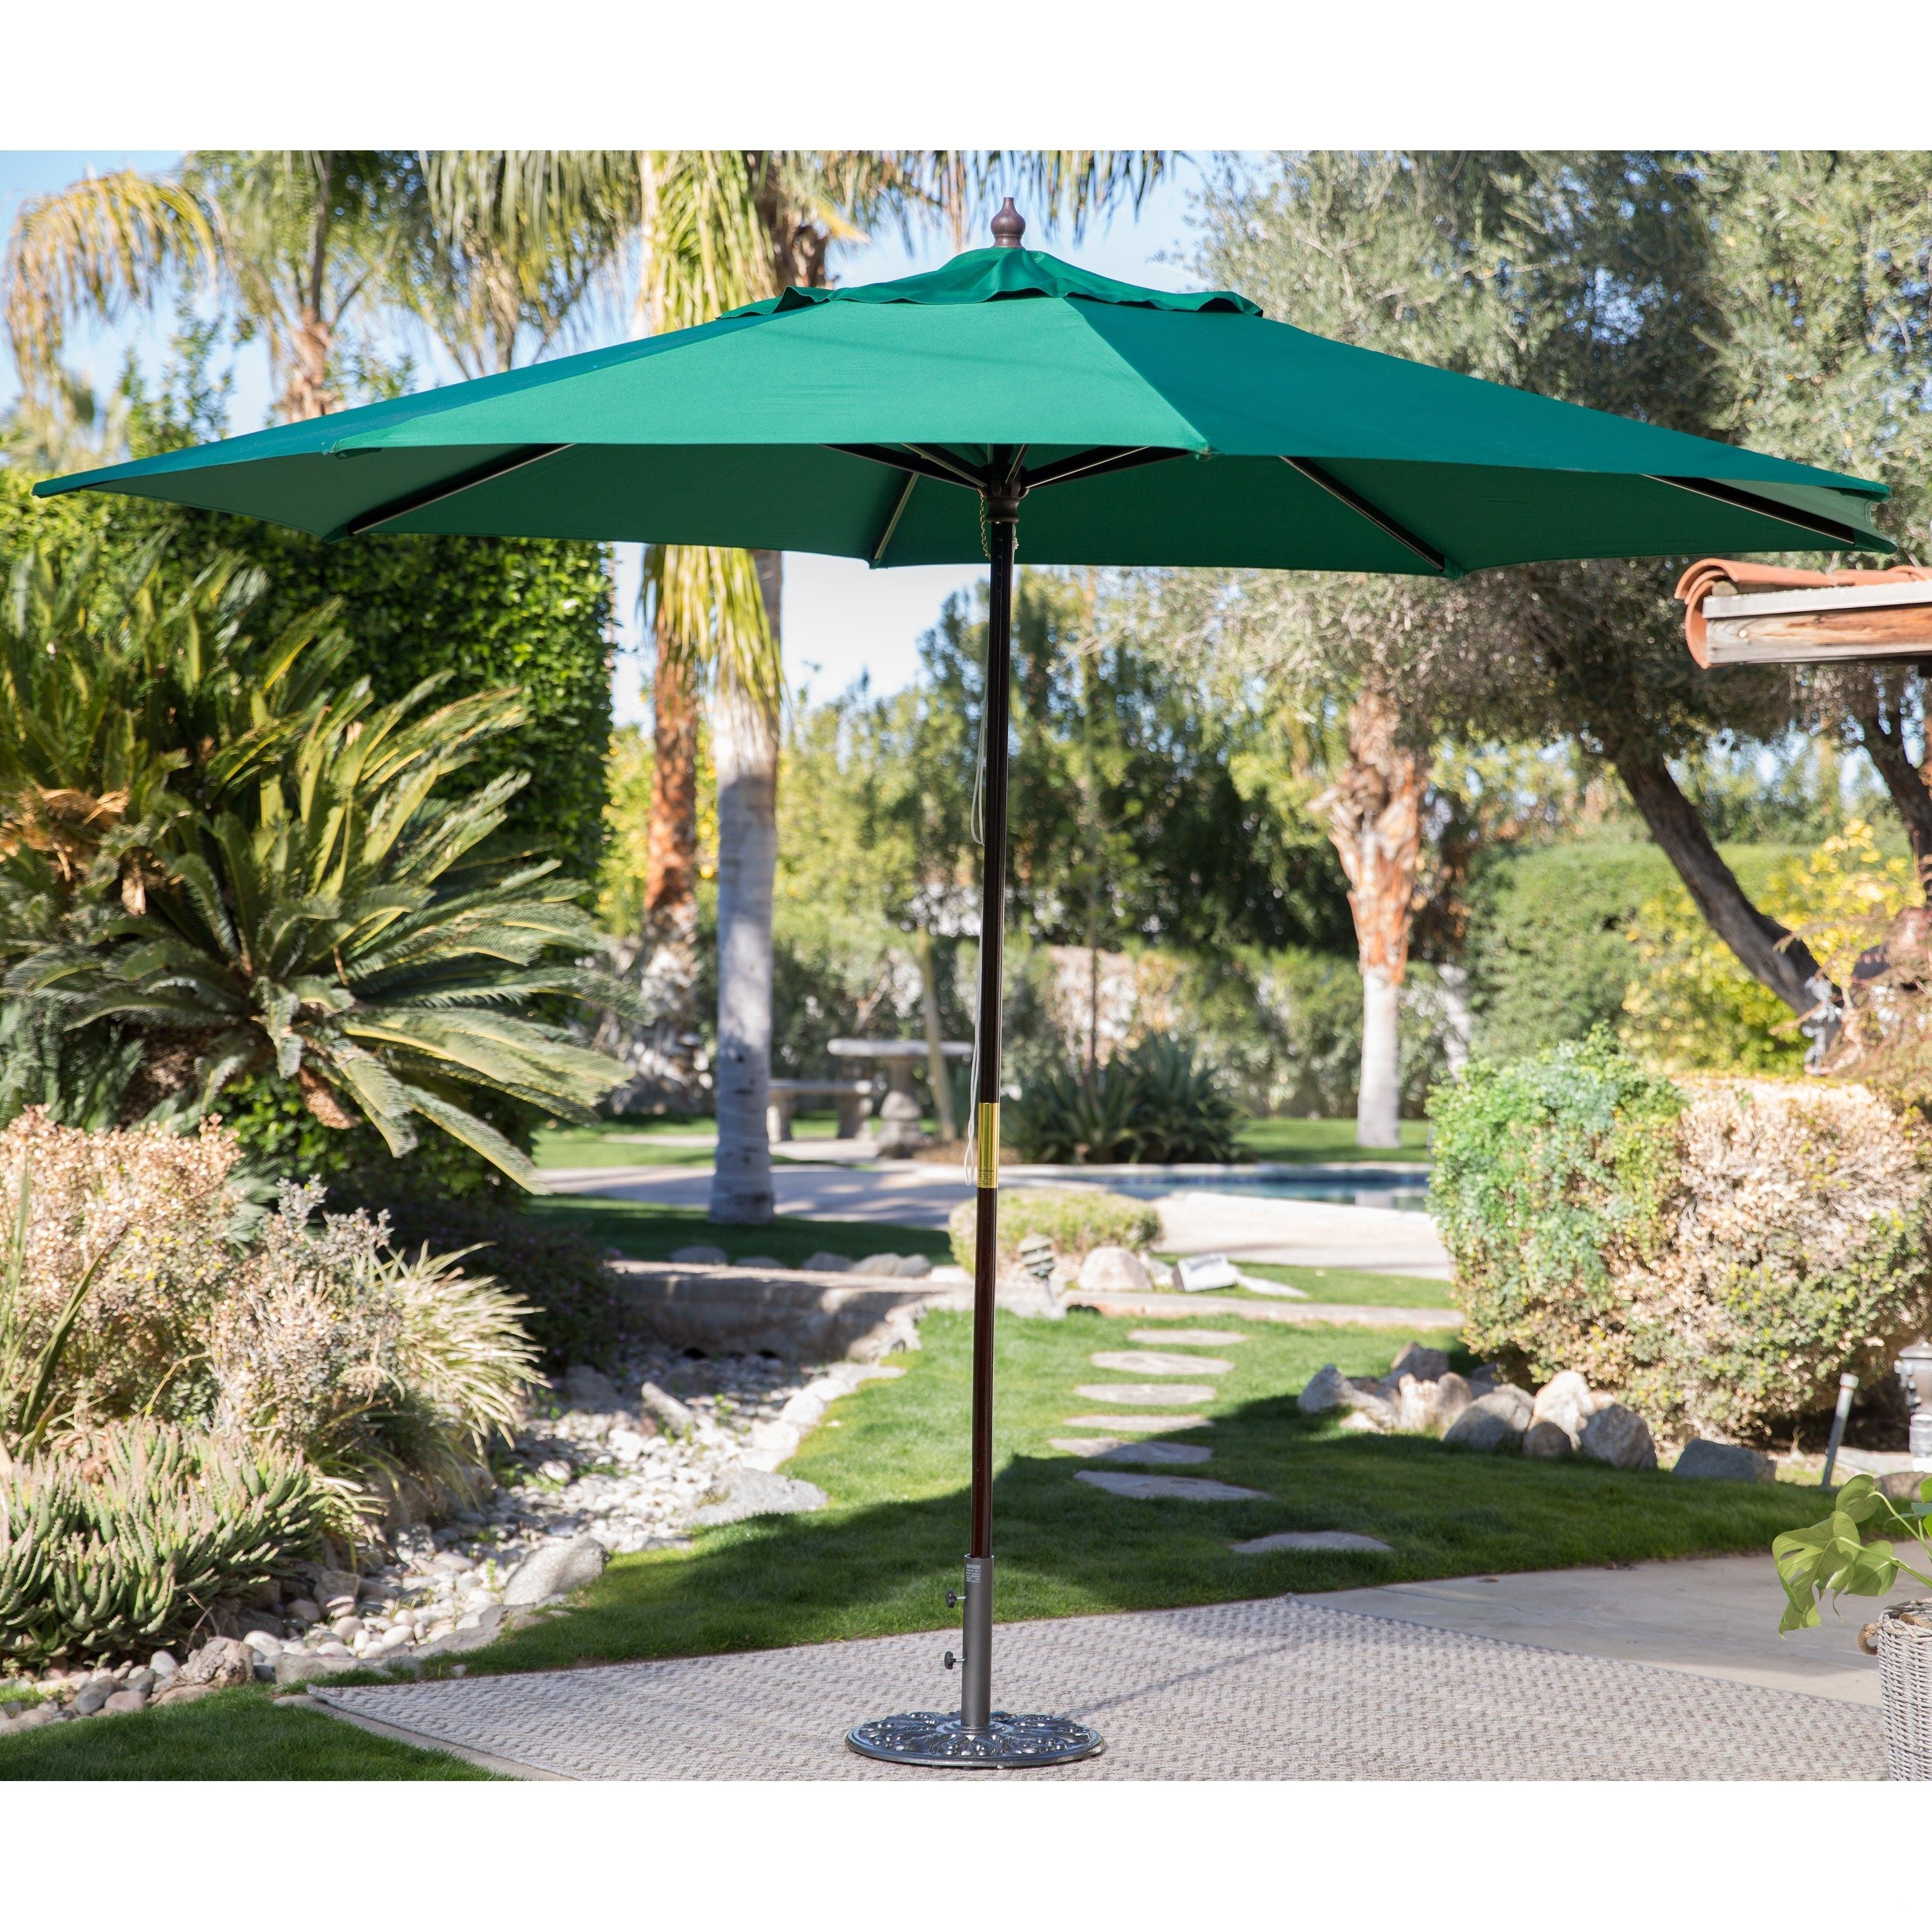 Sunbrella Patio Umbrellas Inside Well Liked Sunbrella Patio Umbrella – Popular For Families Who Have Been (View 16 of 20)